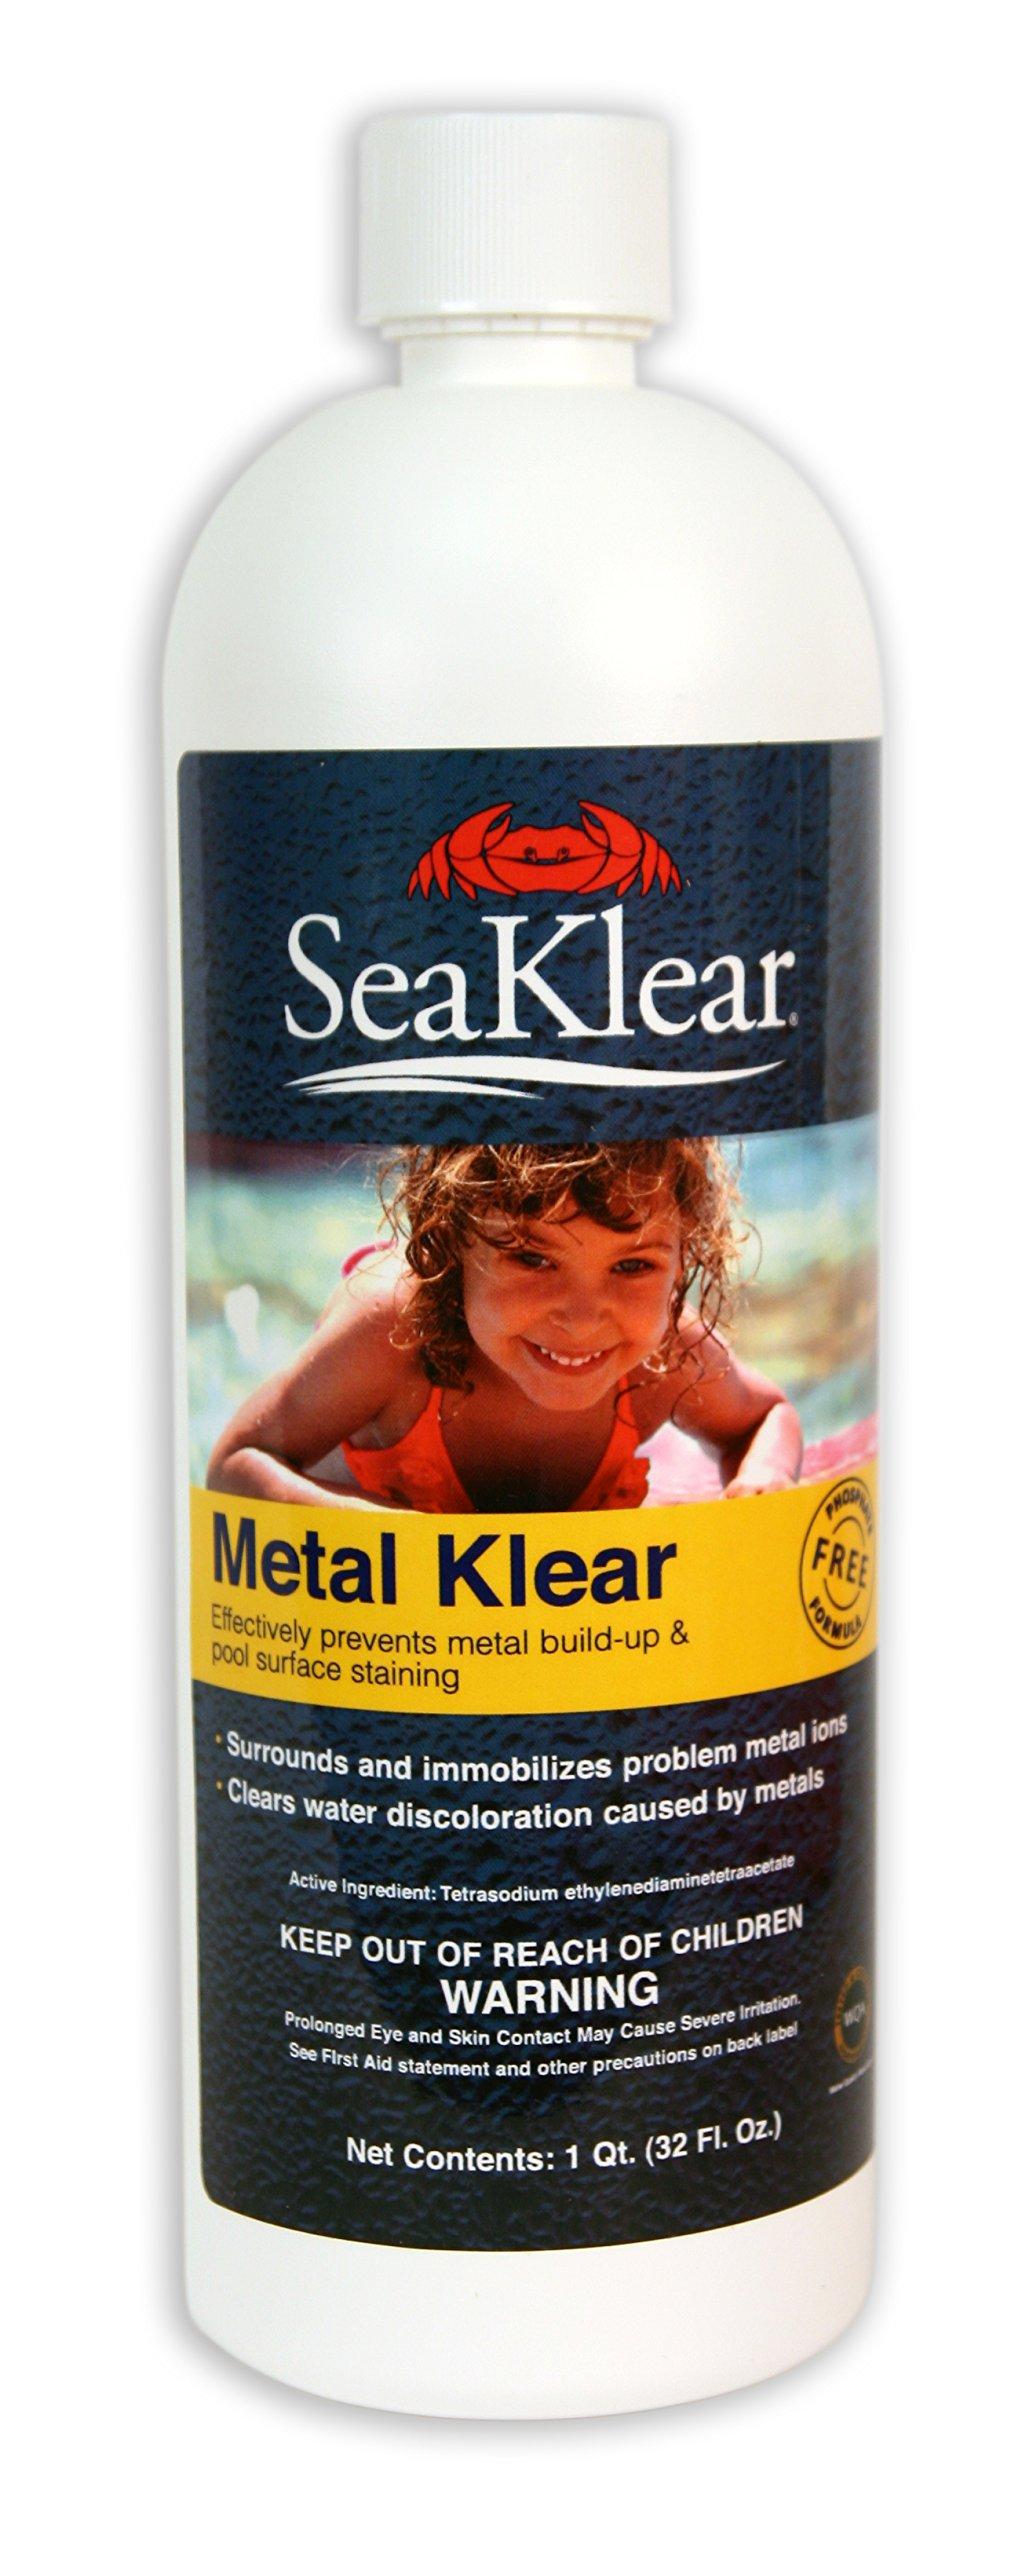 SeaKlear Metal Klear Stain Treatment Solution, 1-Quart by SeaKlear